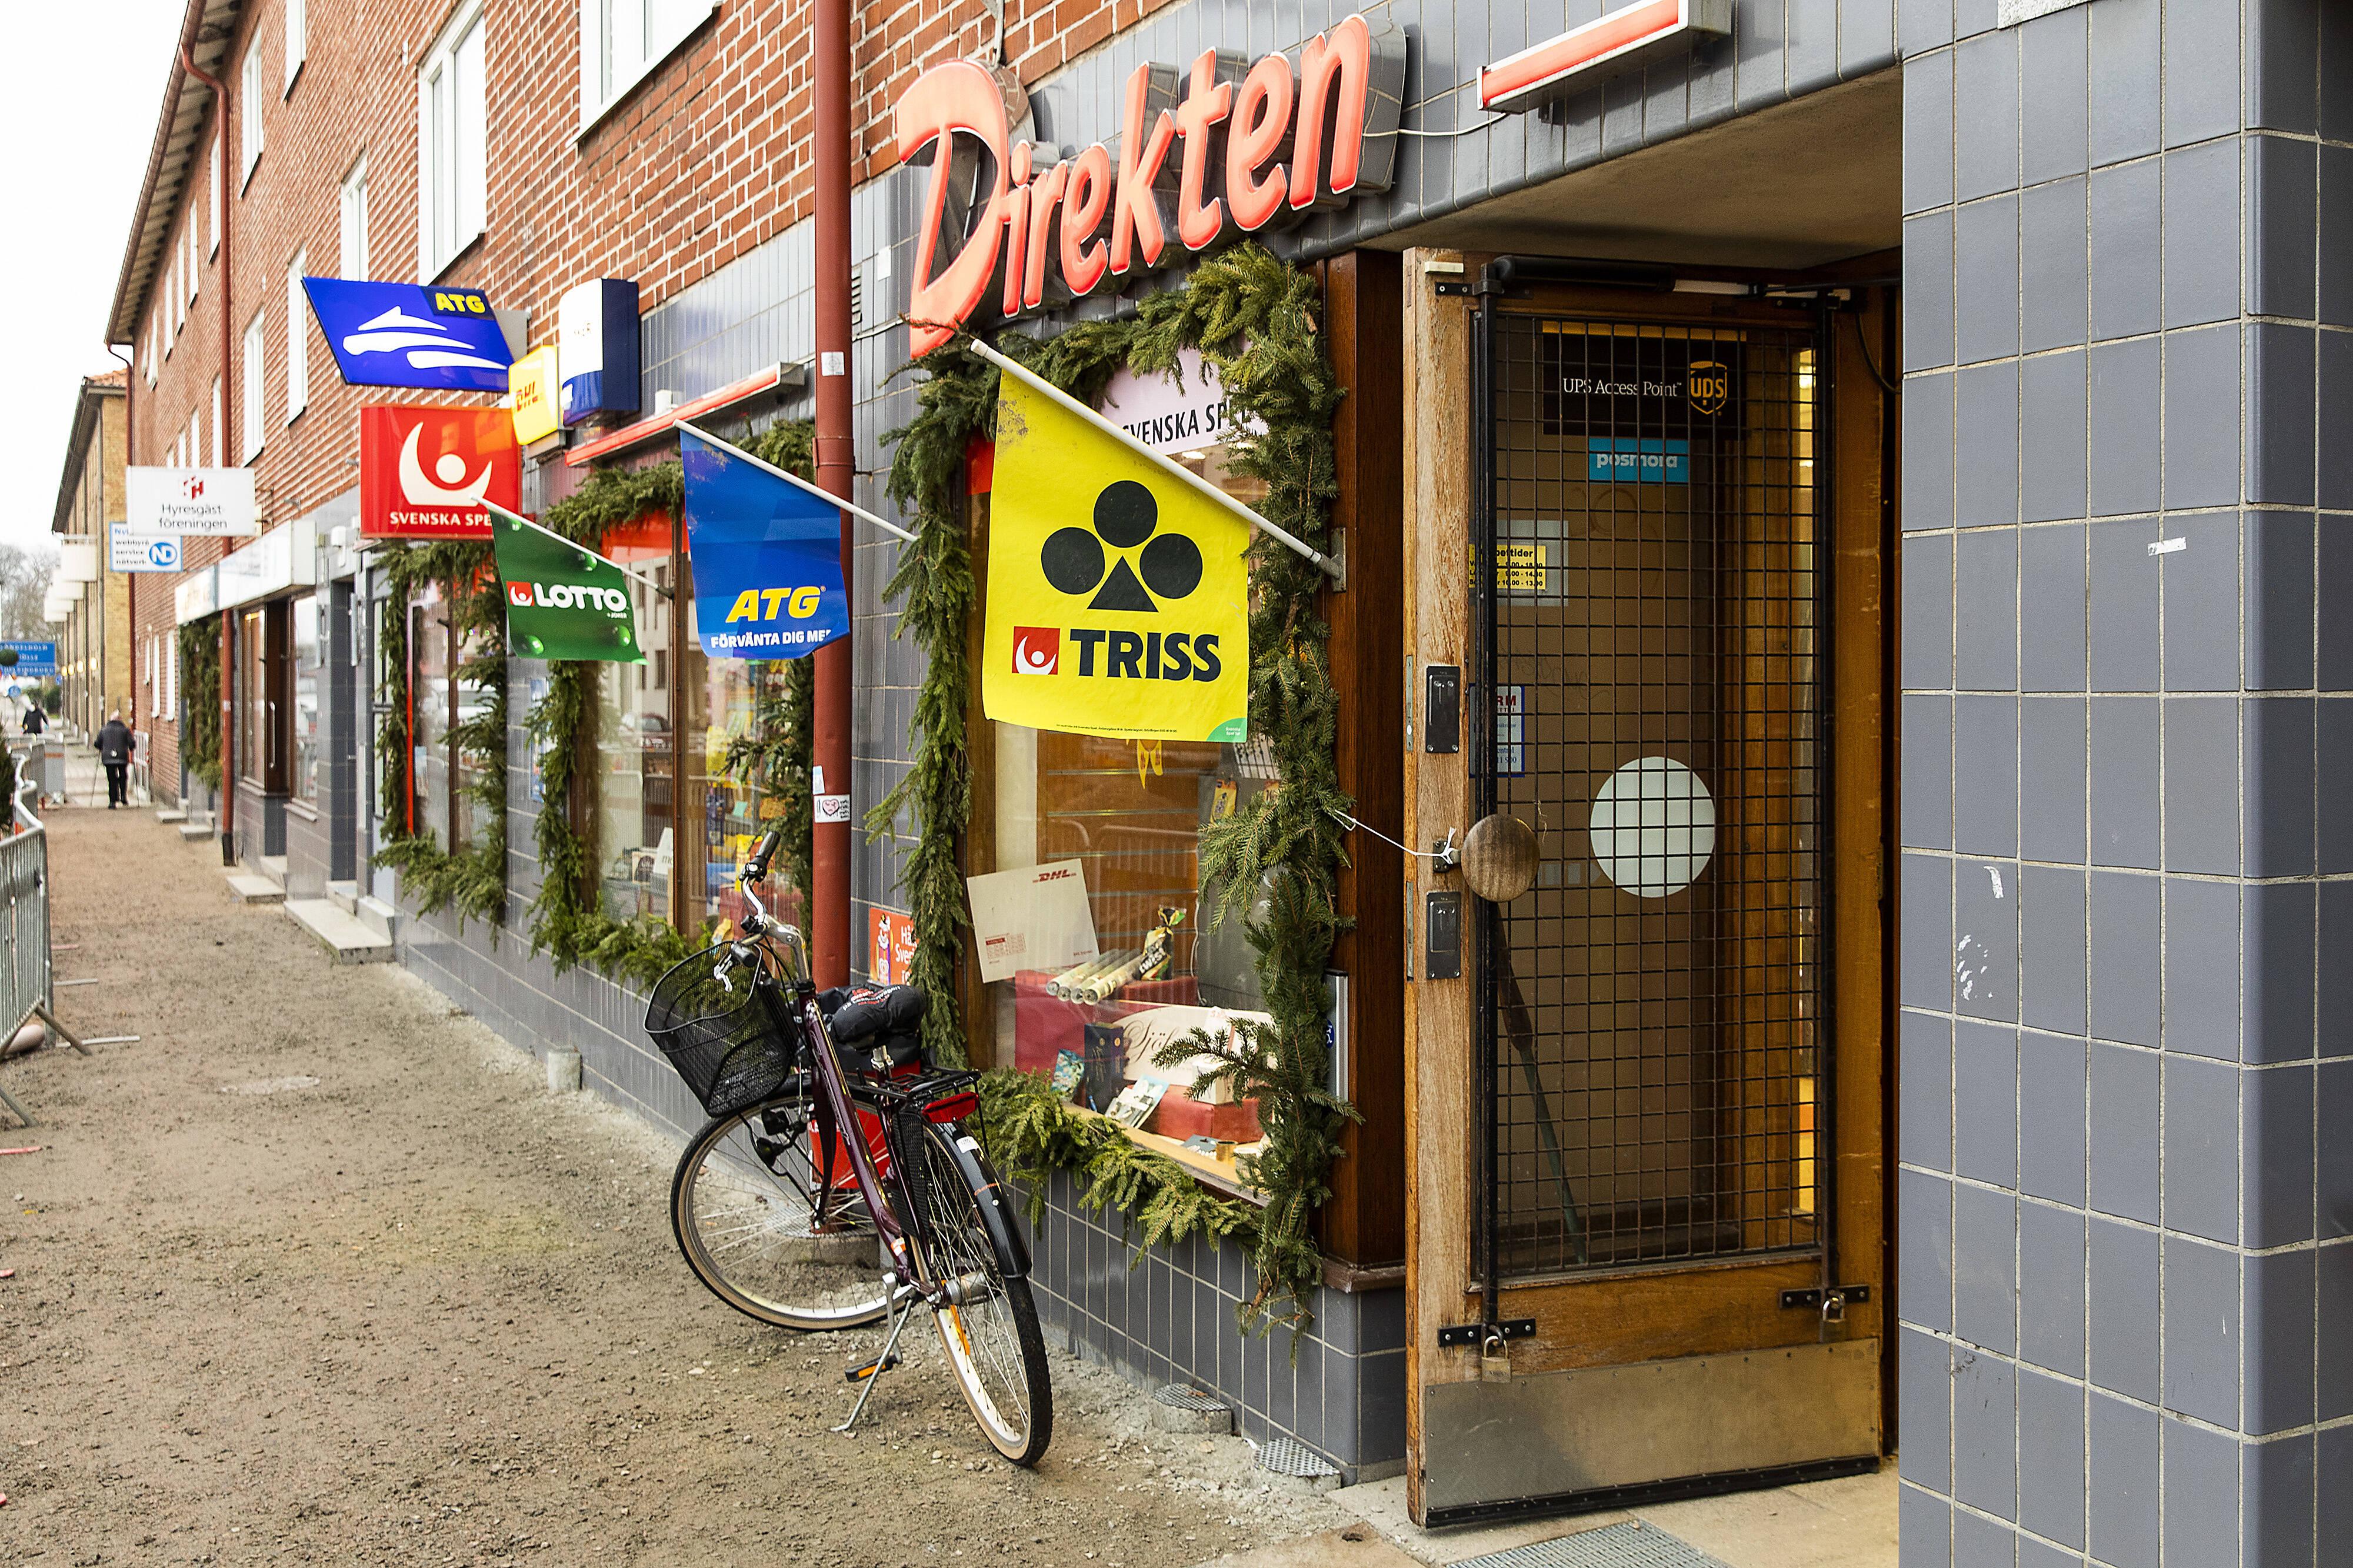 Storgatan_57_201210_01